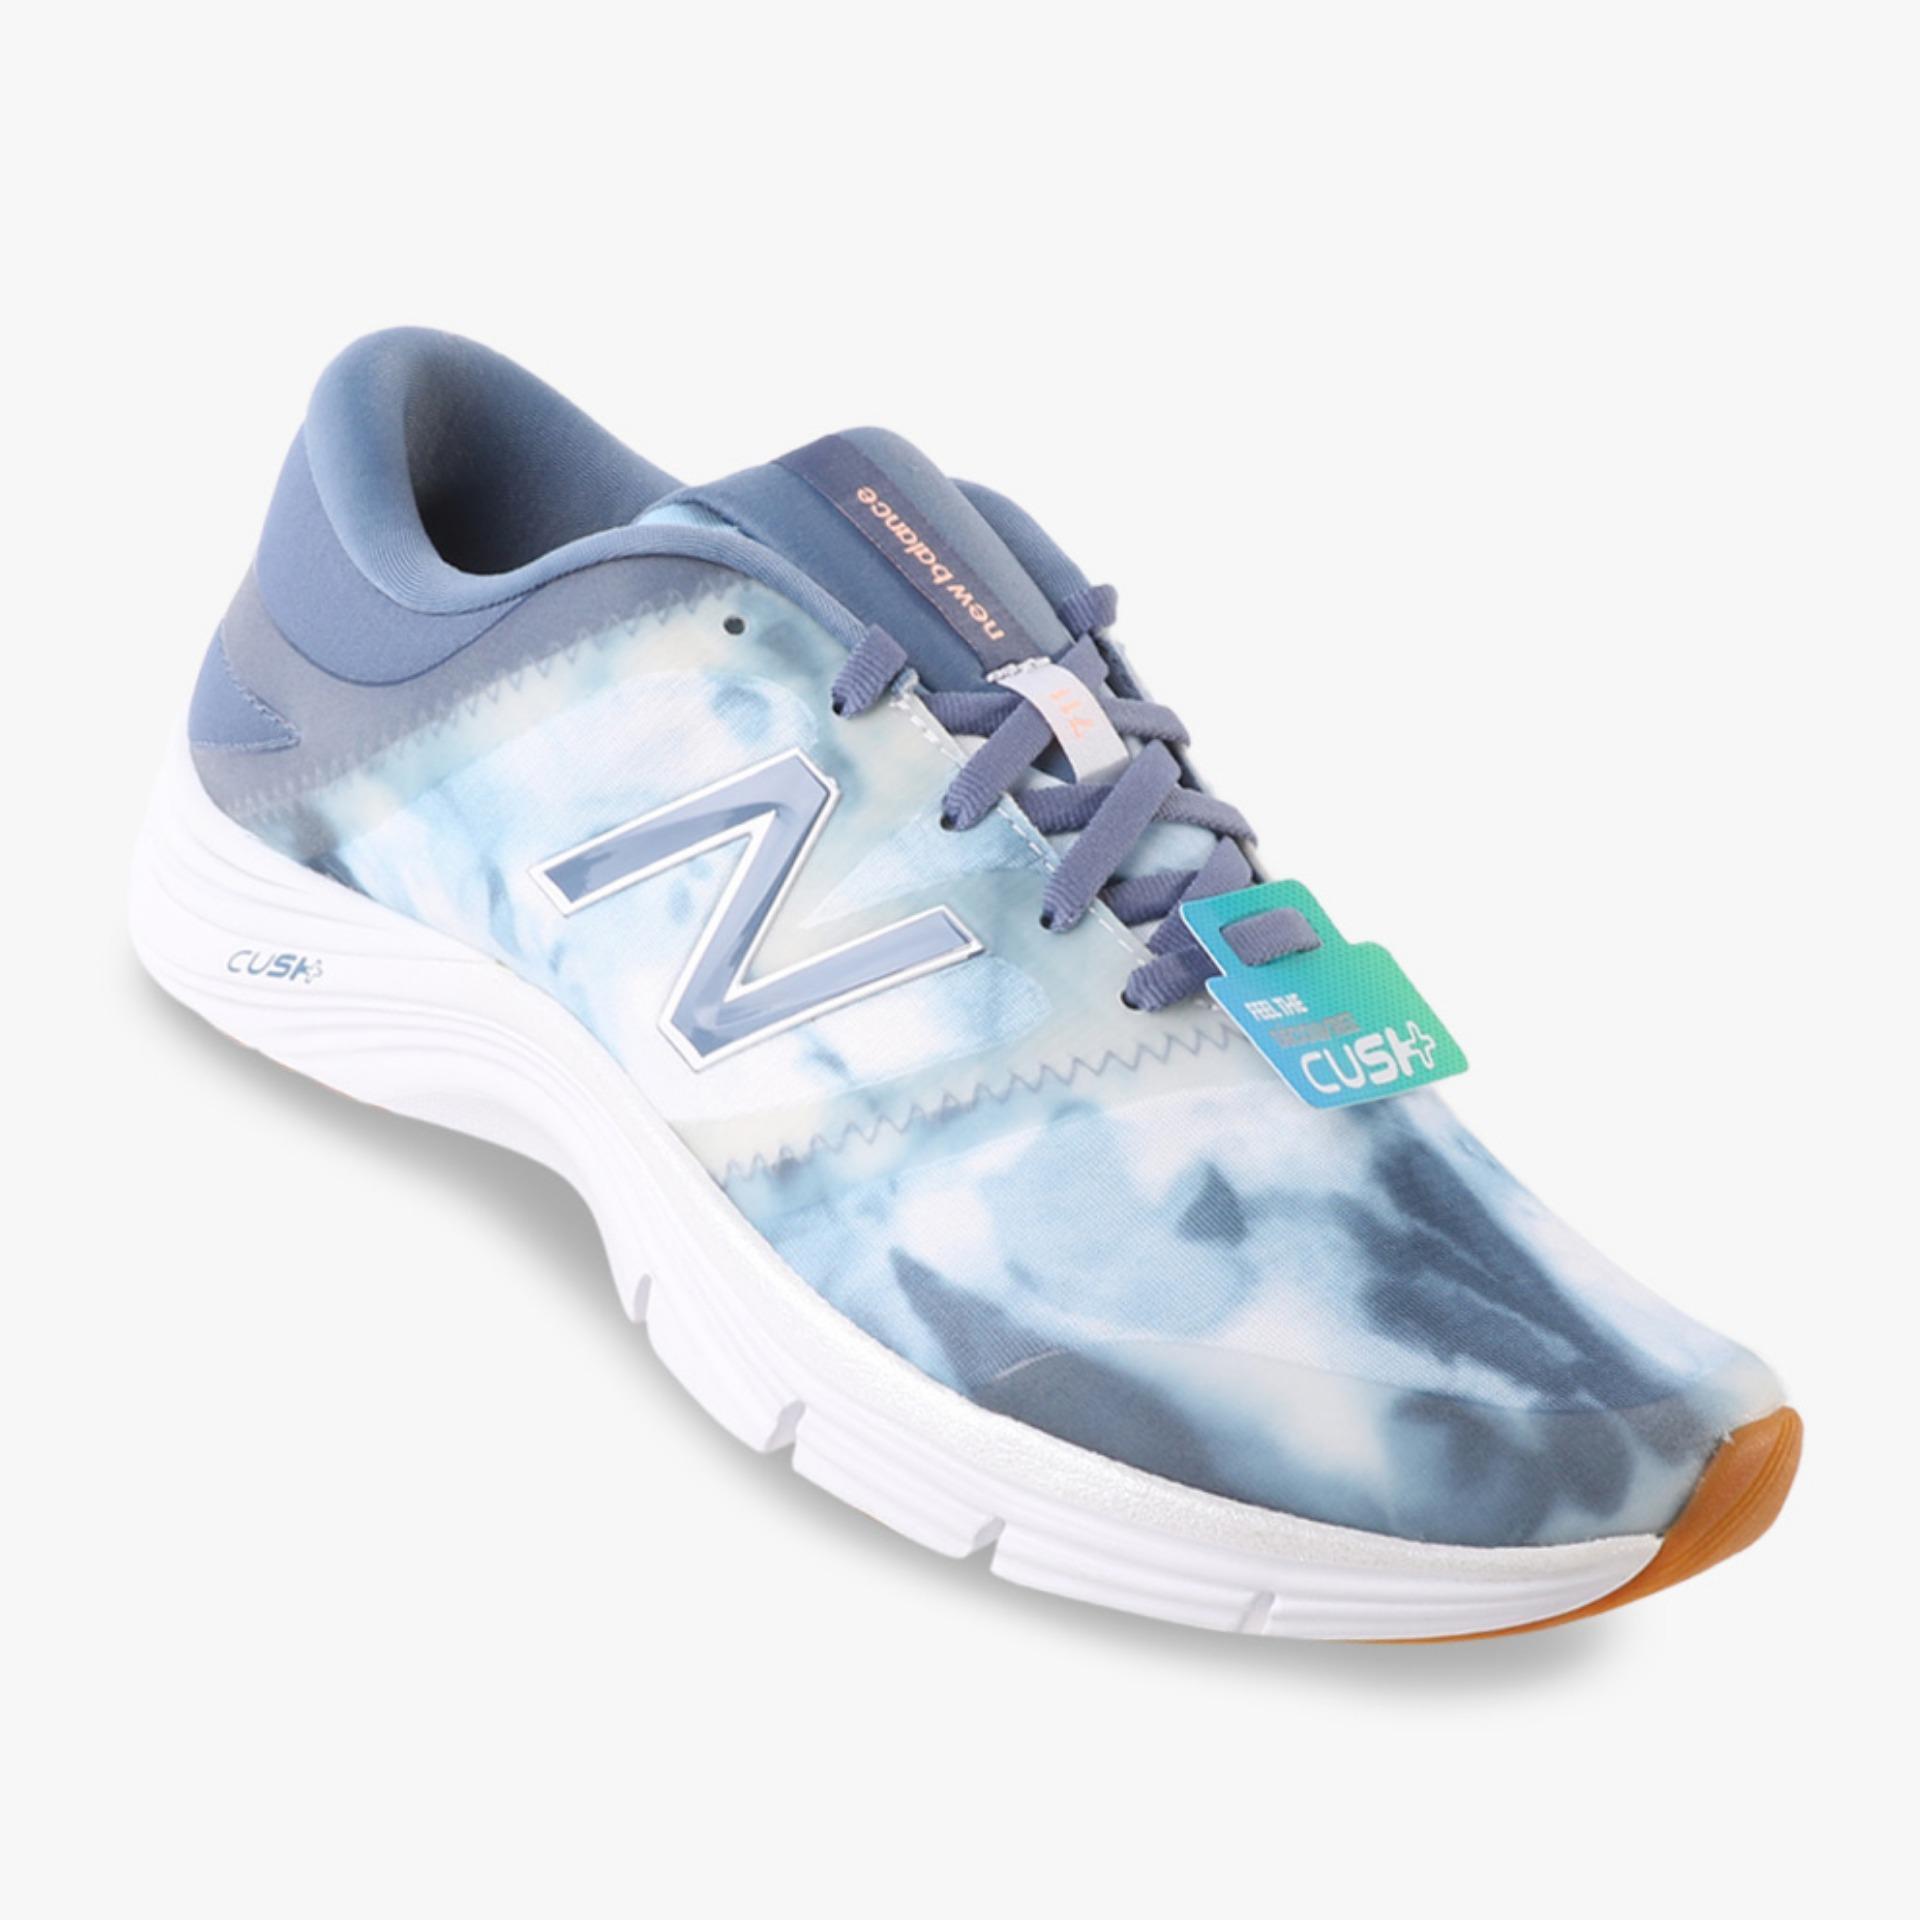 New Balance Graphic Pack Women S Training Shoes Biru Di Indonesia